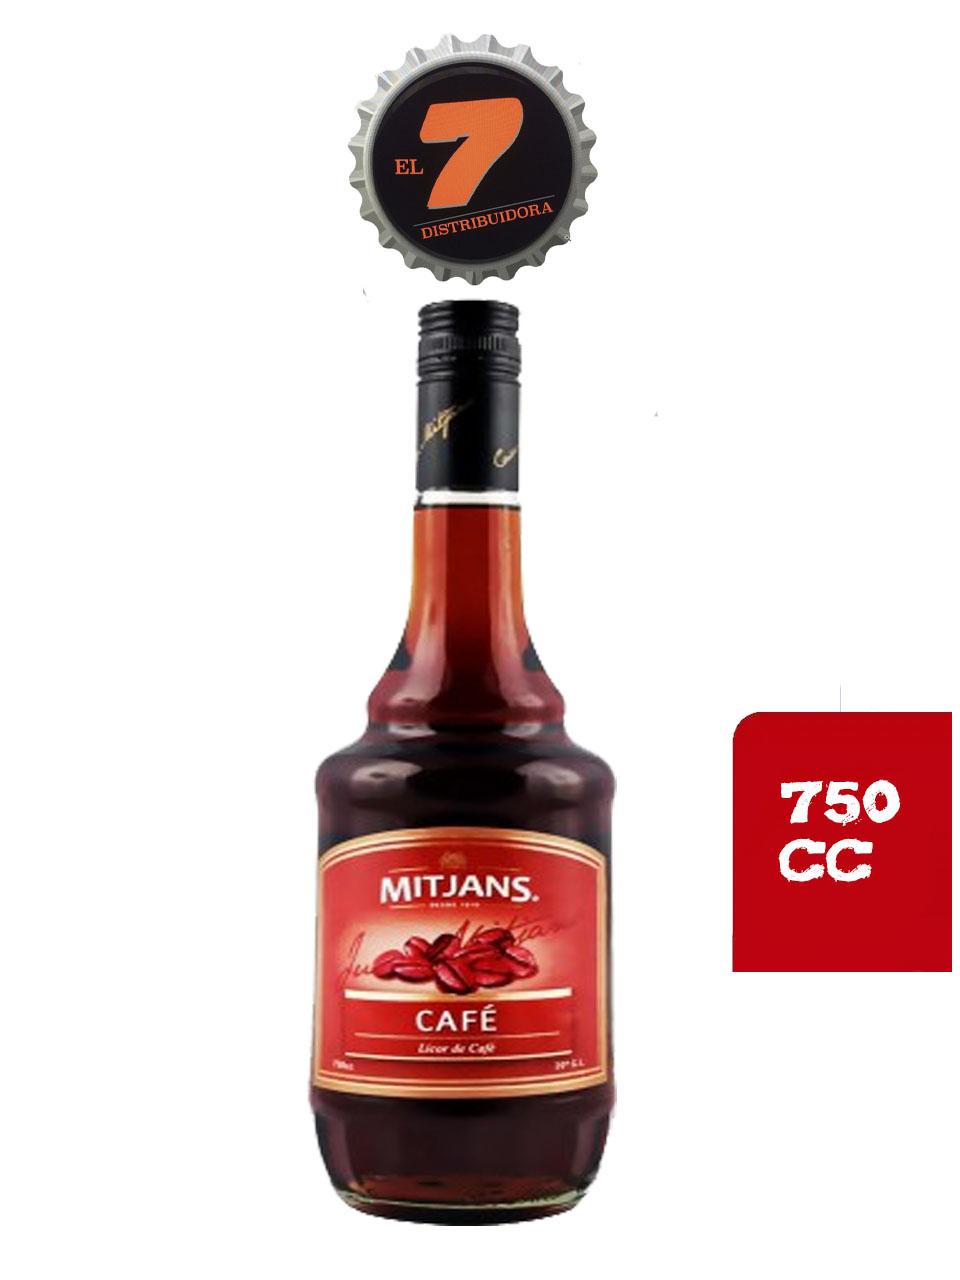 Mitjans Cafe 750 CC